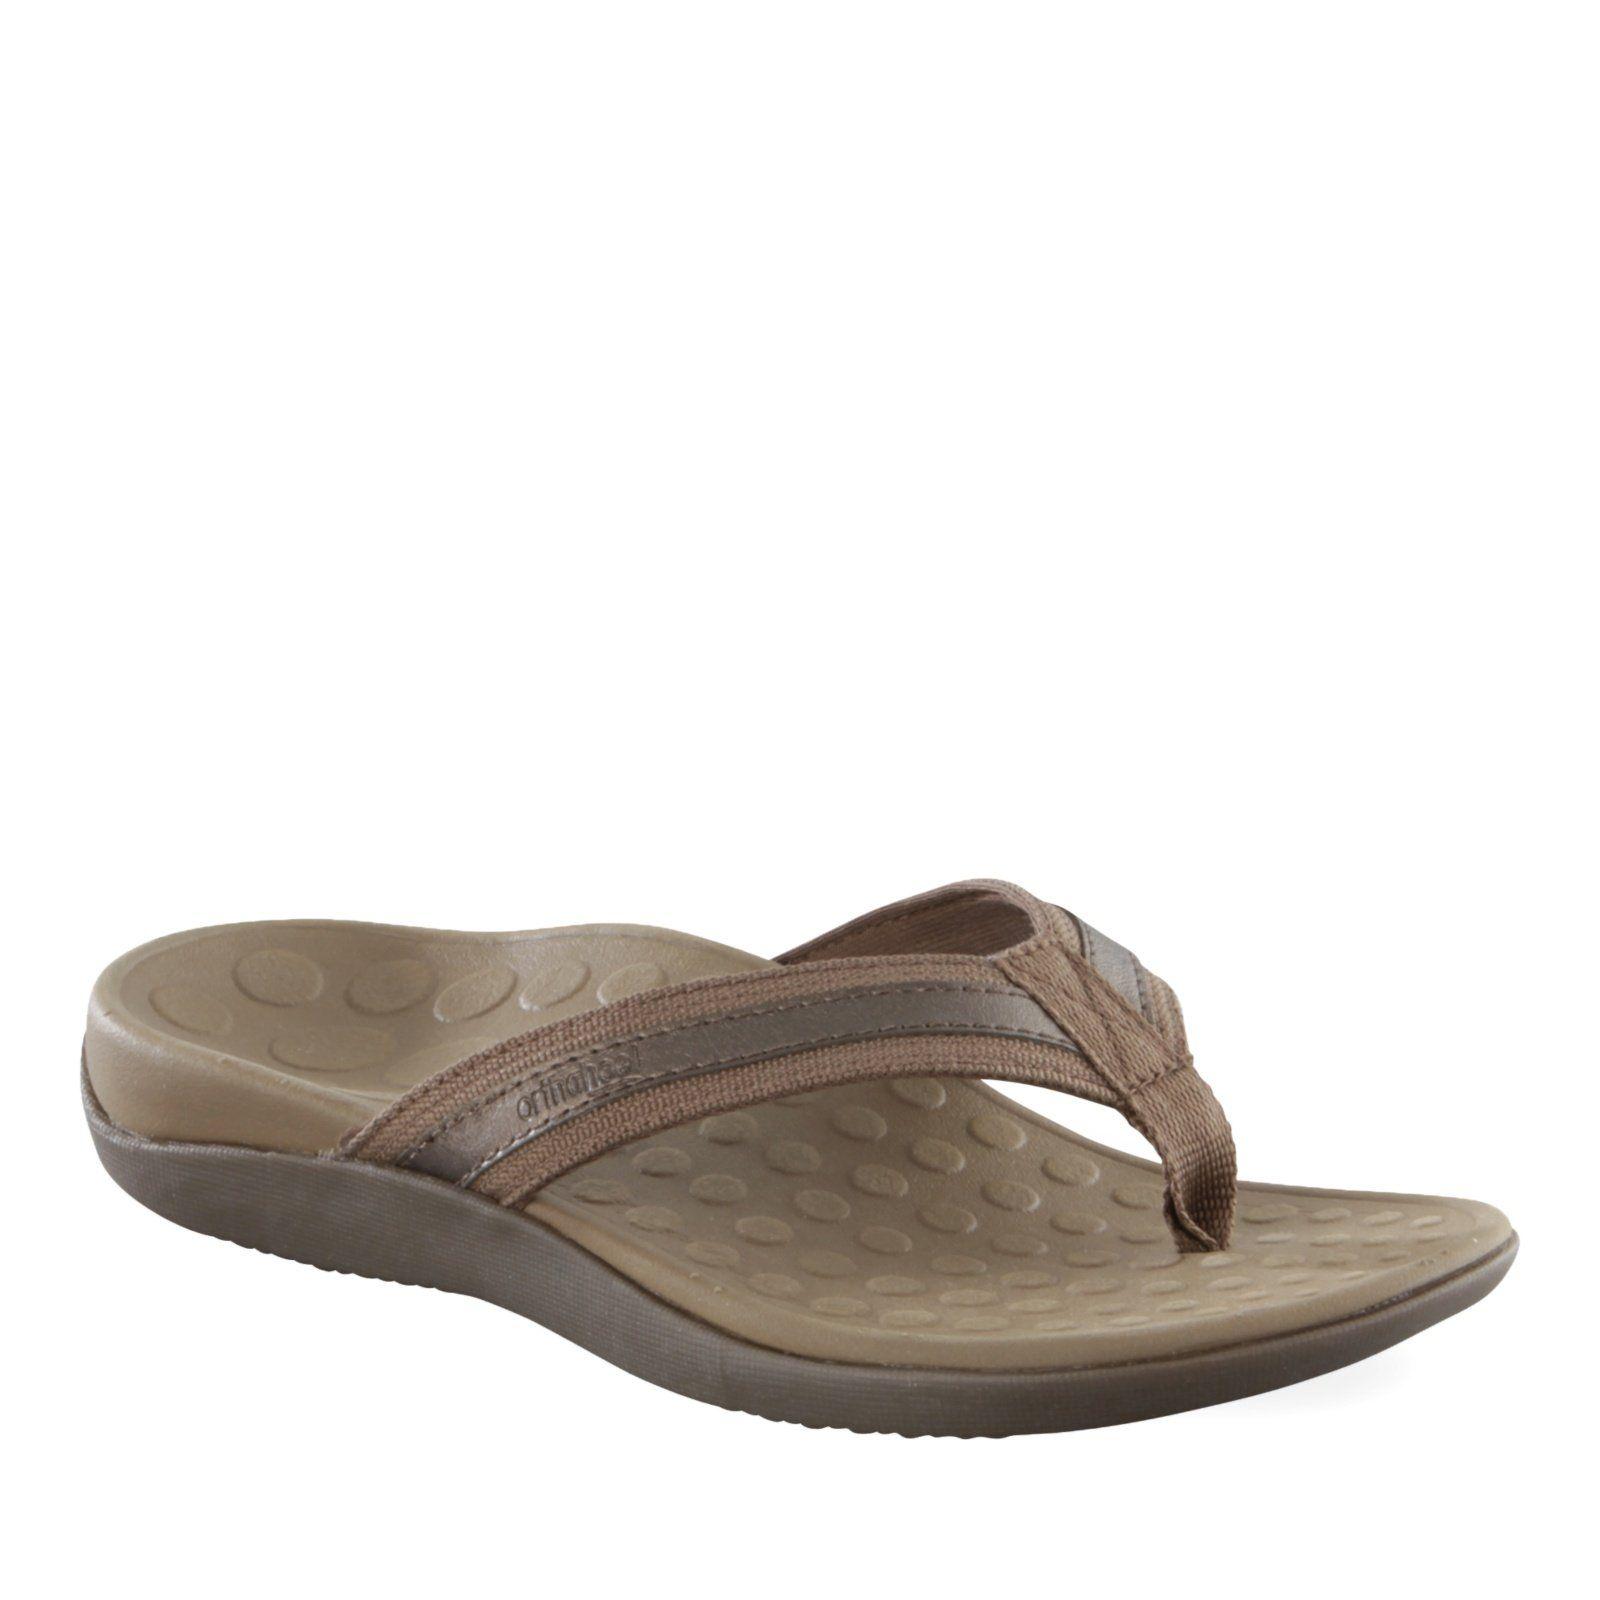 c3642c57cf9 Amazon.com  Orthaheel Women s Raspberry Tan Tide 6 B(M) US  Shoes ...